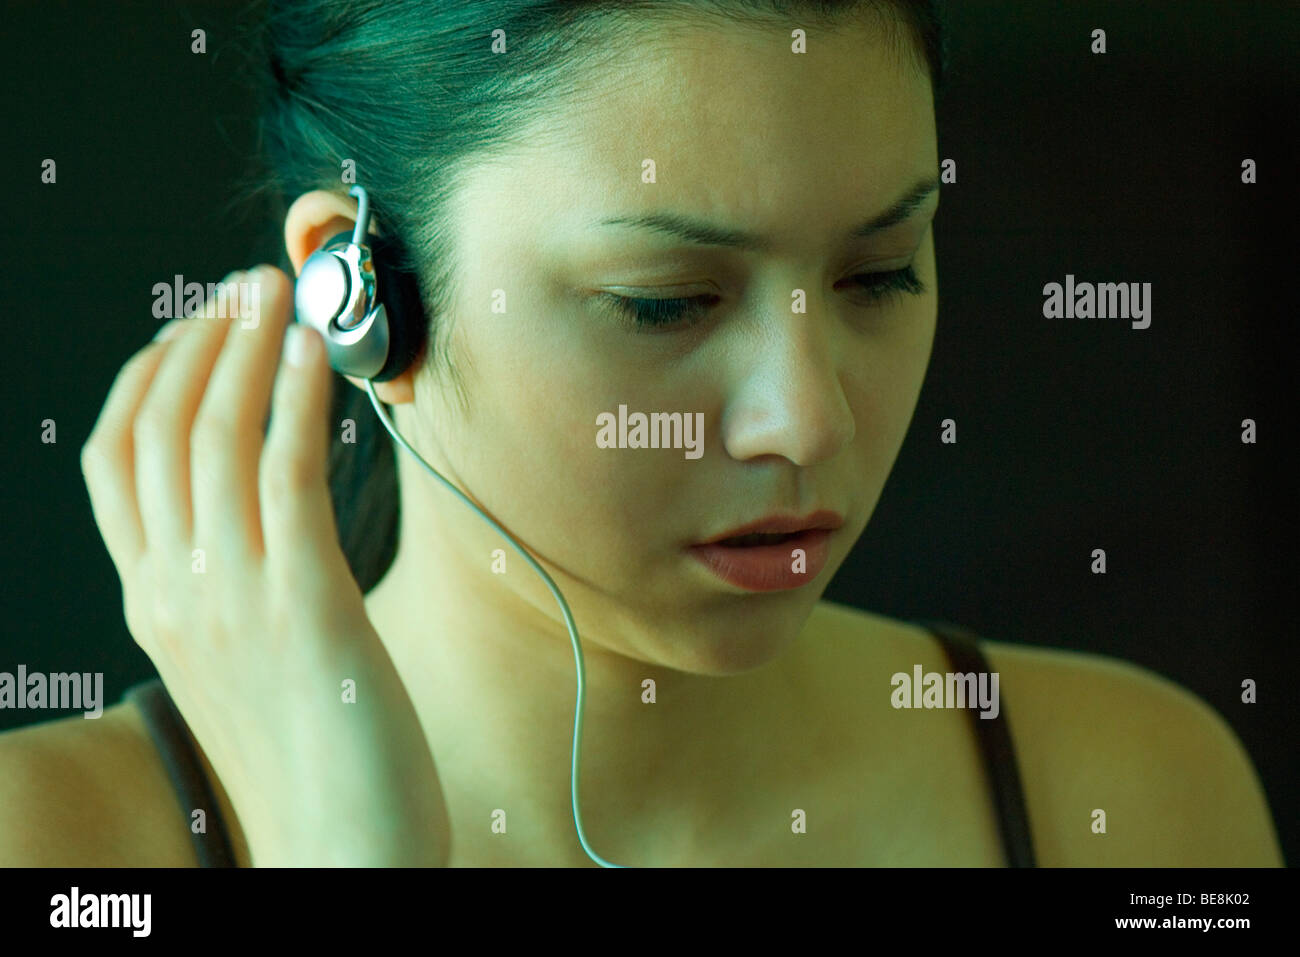 Woman listening to headphones, furrowing brow - Stock Image